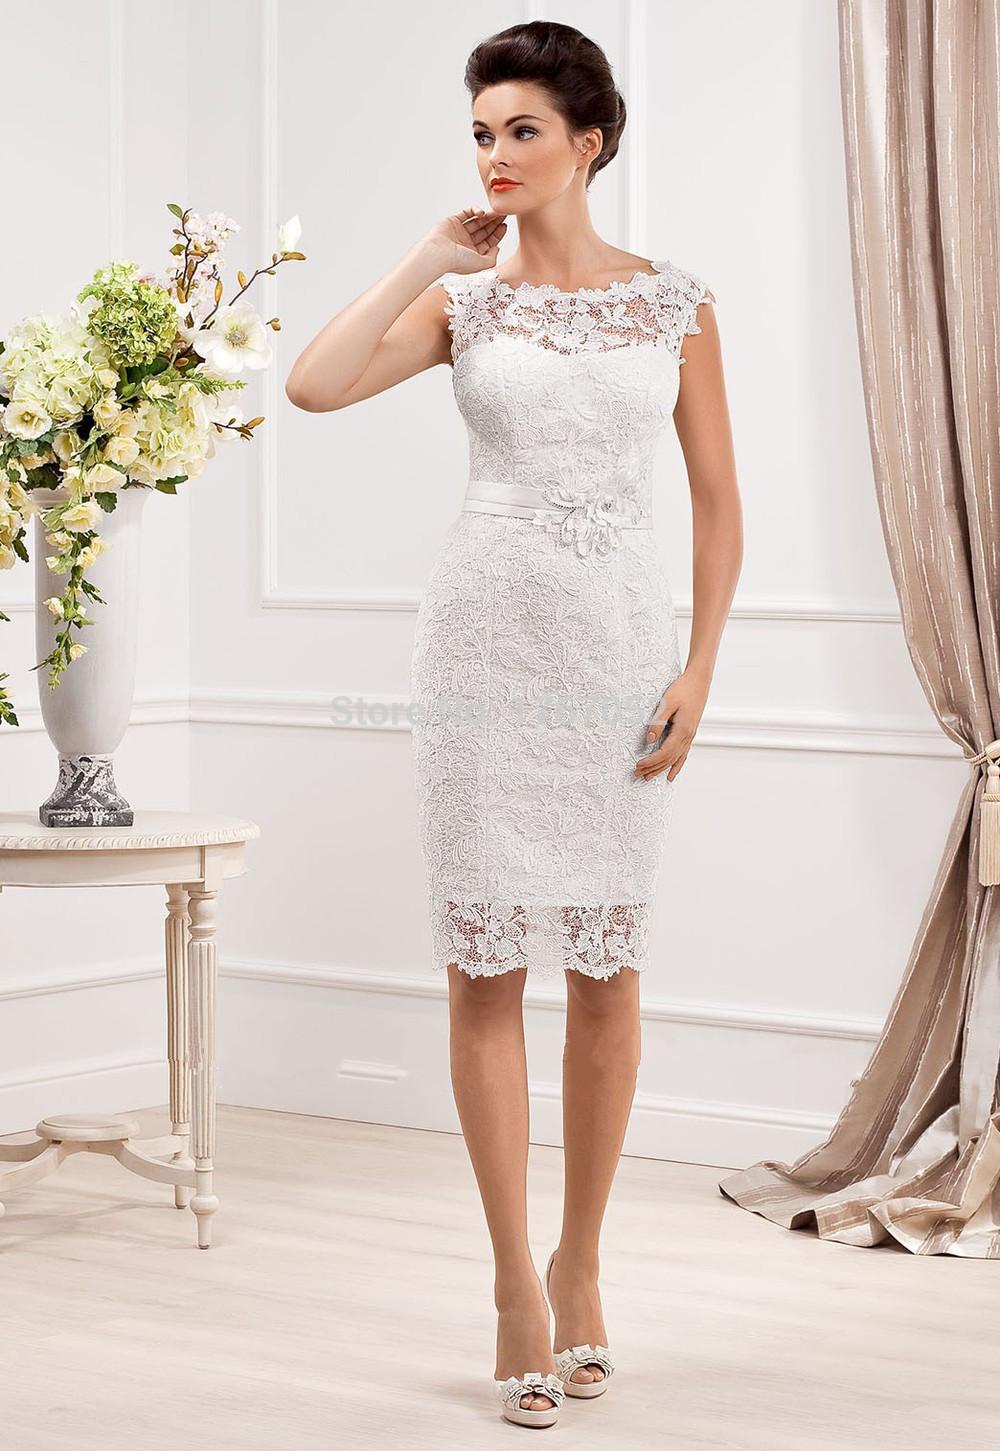 scoop neckline wedding dresses photo - 1